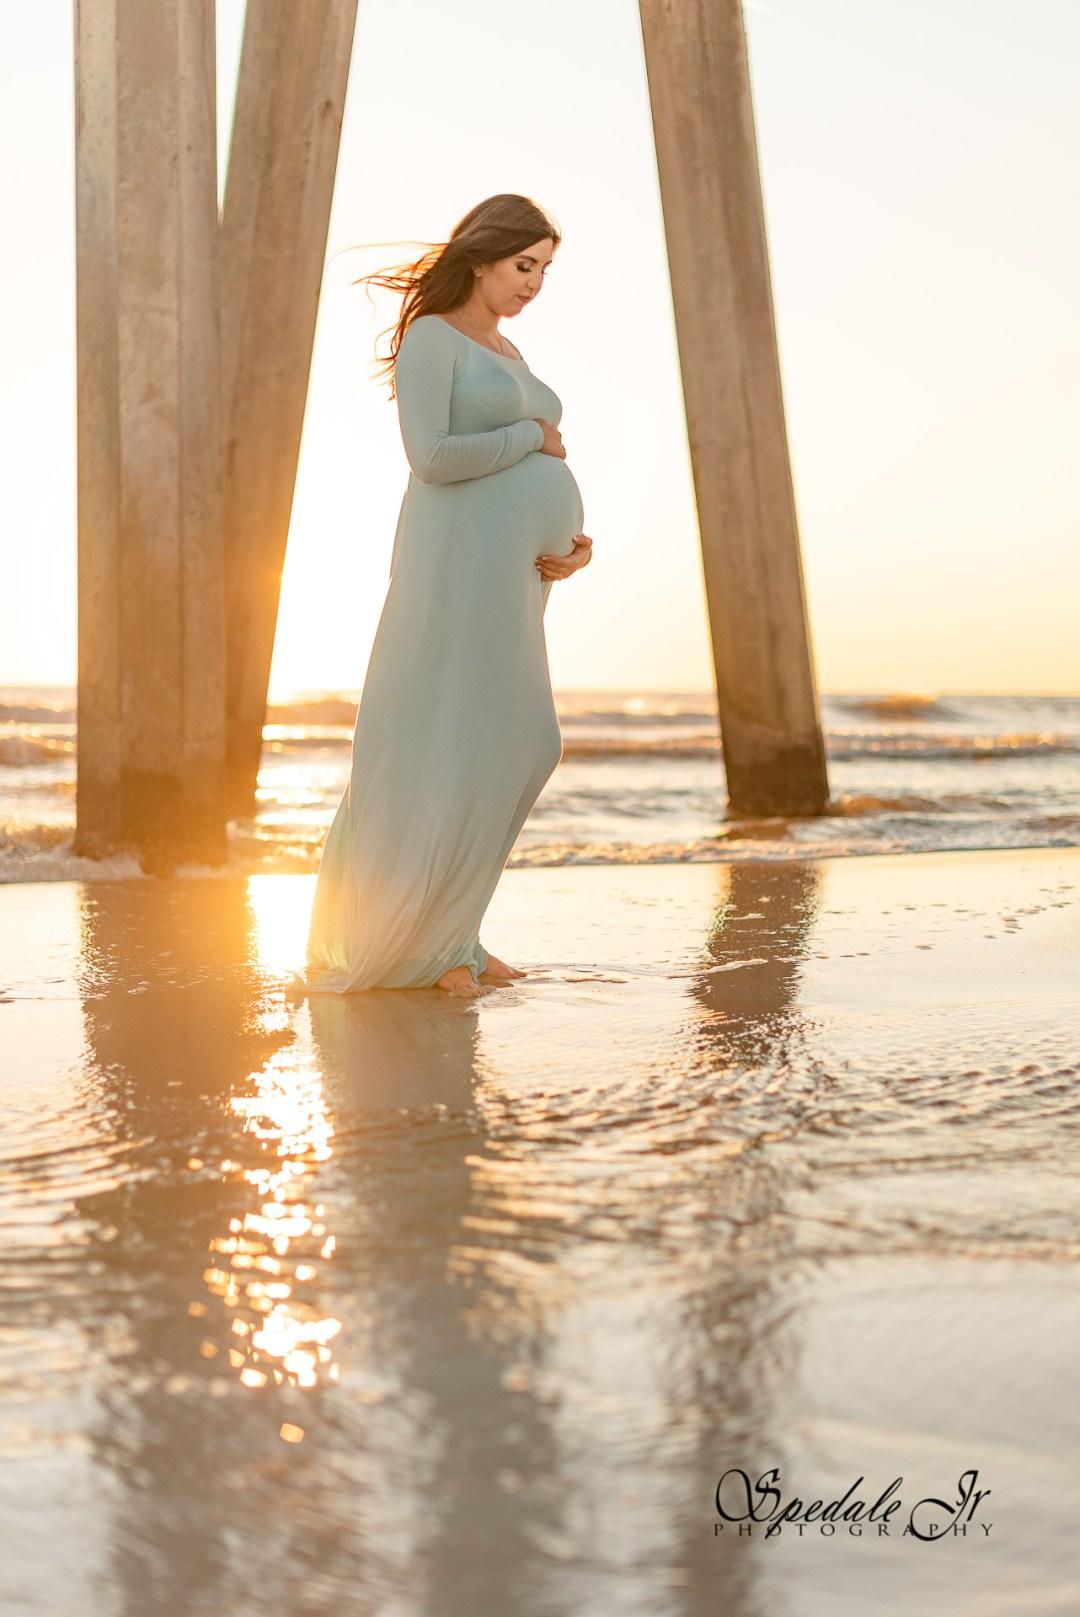 maternity photographer panama city spedale jr photography llc